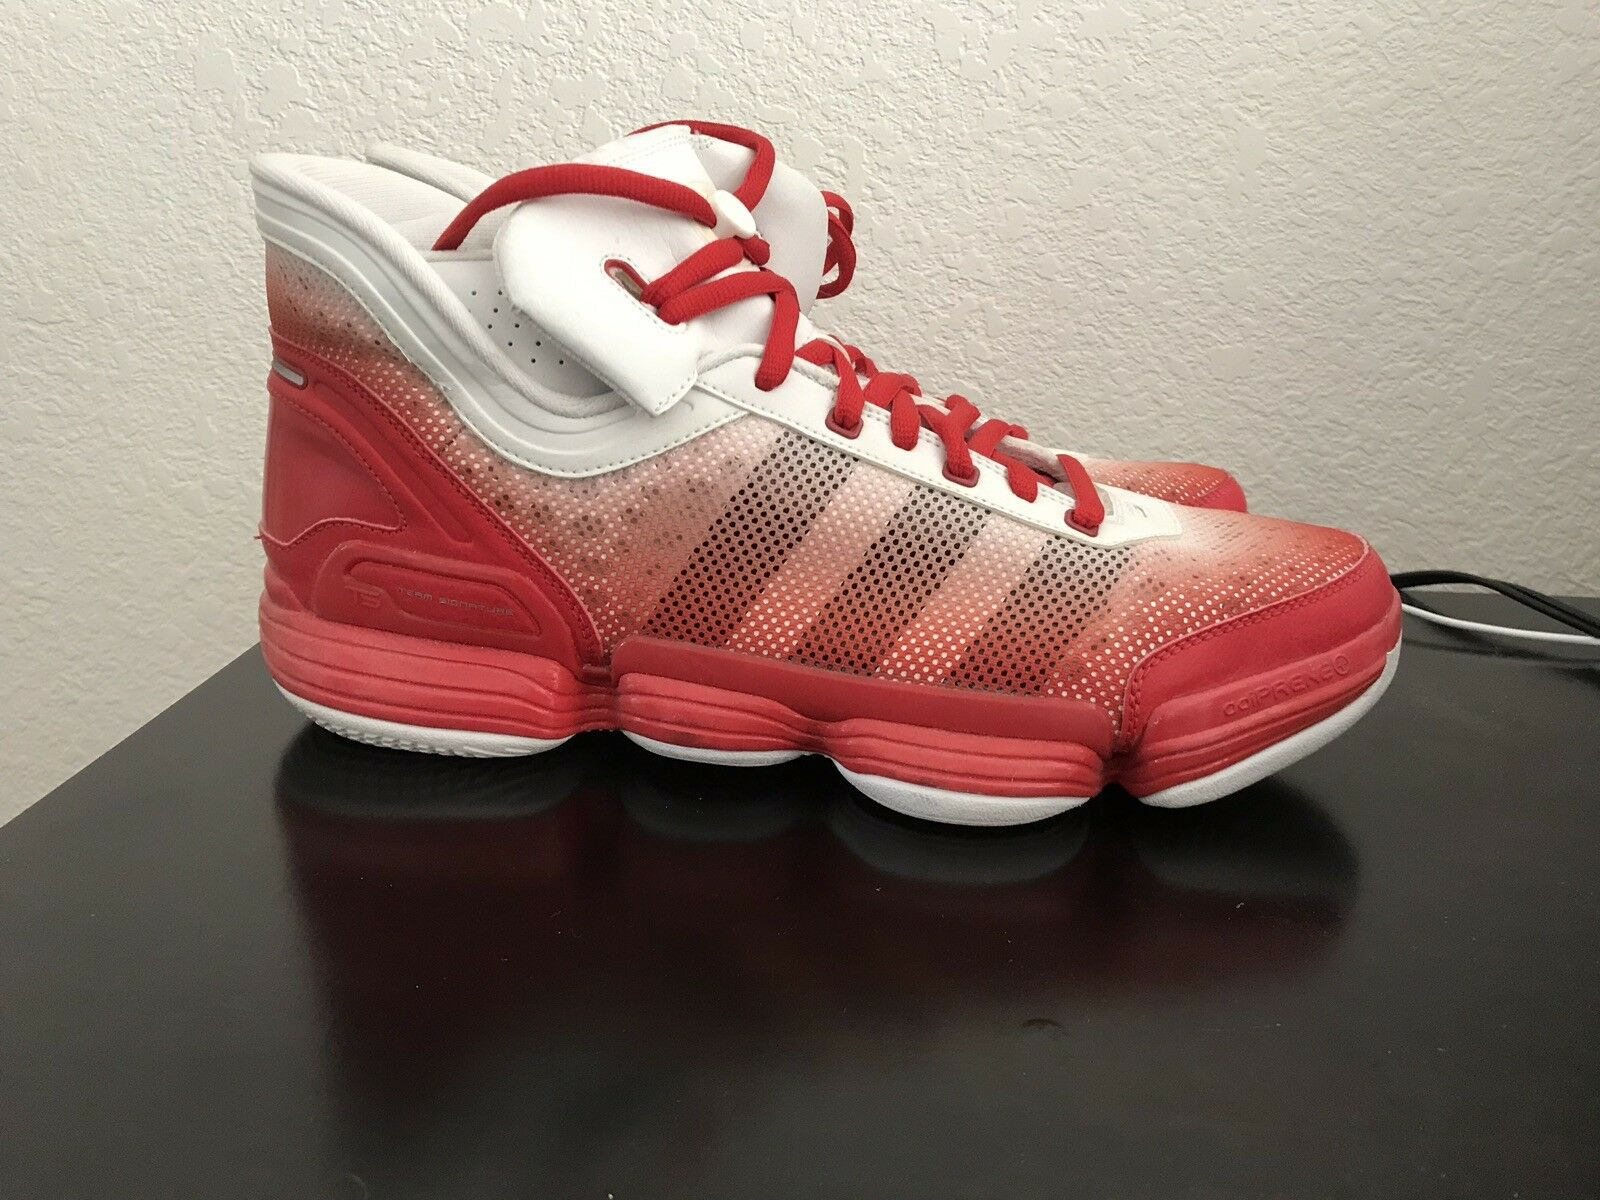 Adidas TS Heat Check Mens Basketball shoes Size 13